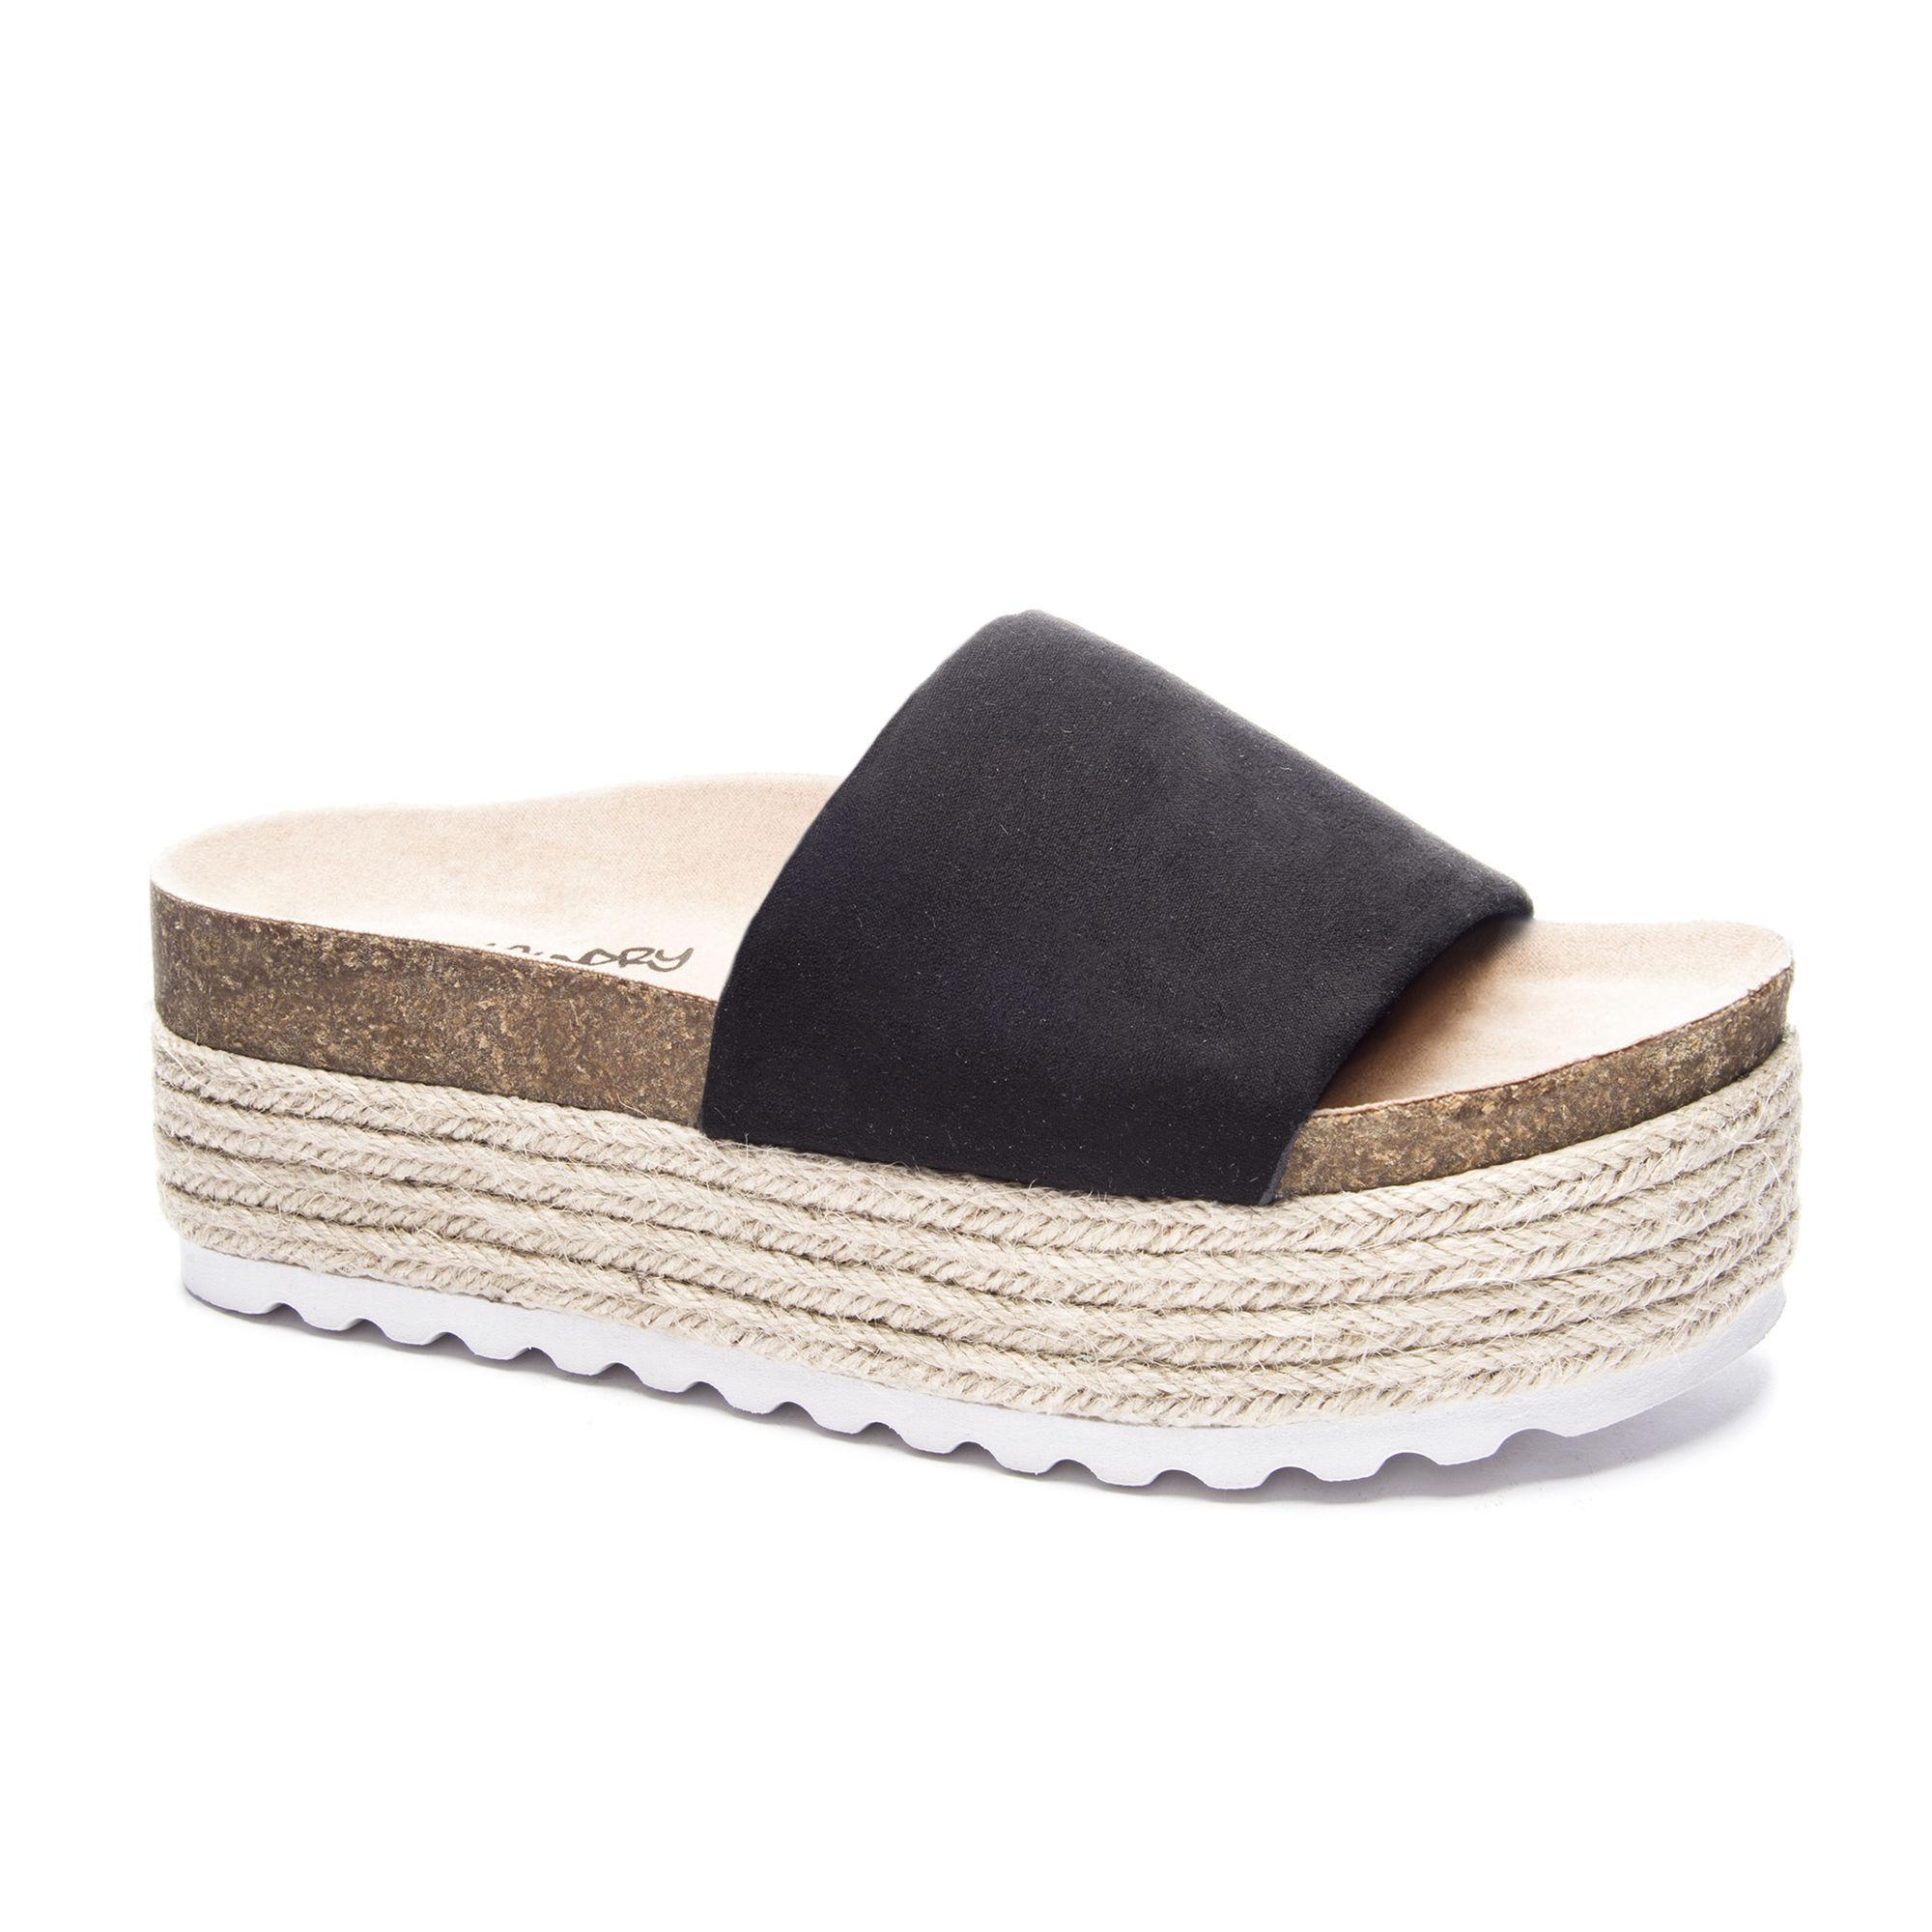 ef67179061c0 Lyst - Dirty Laundry Pippa Slide Sandal in Black